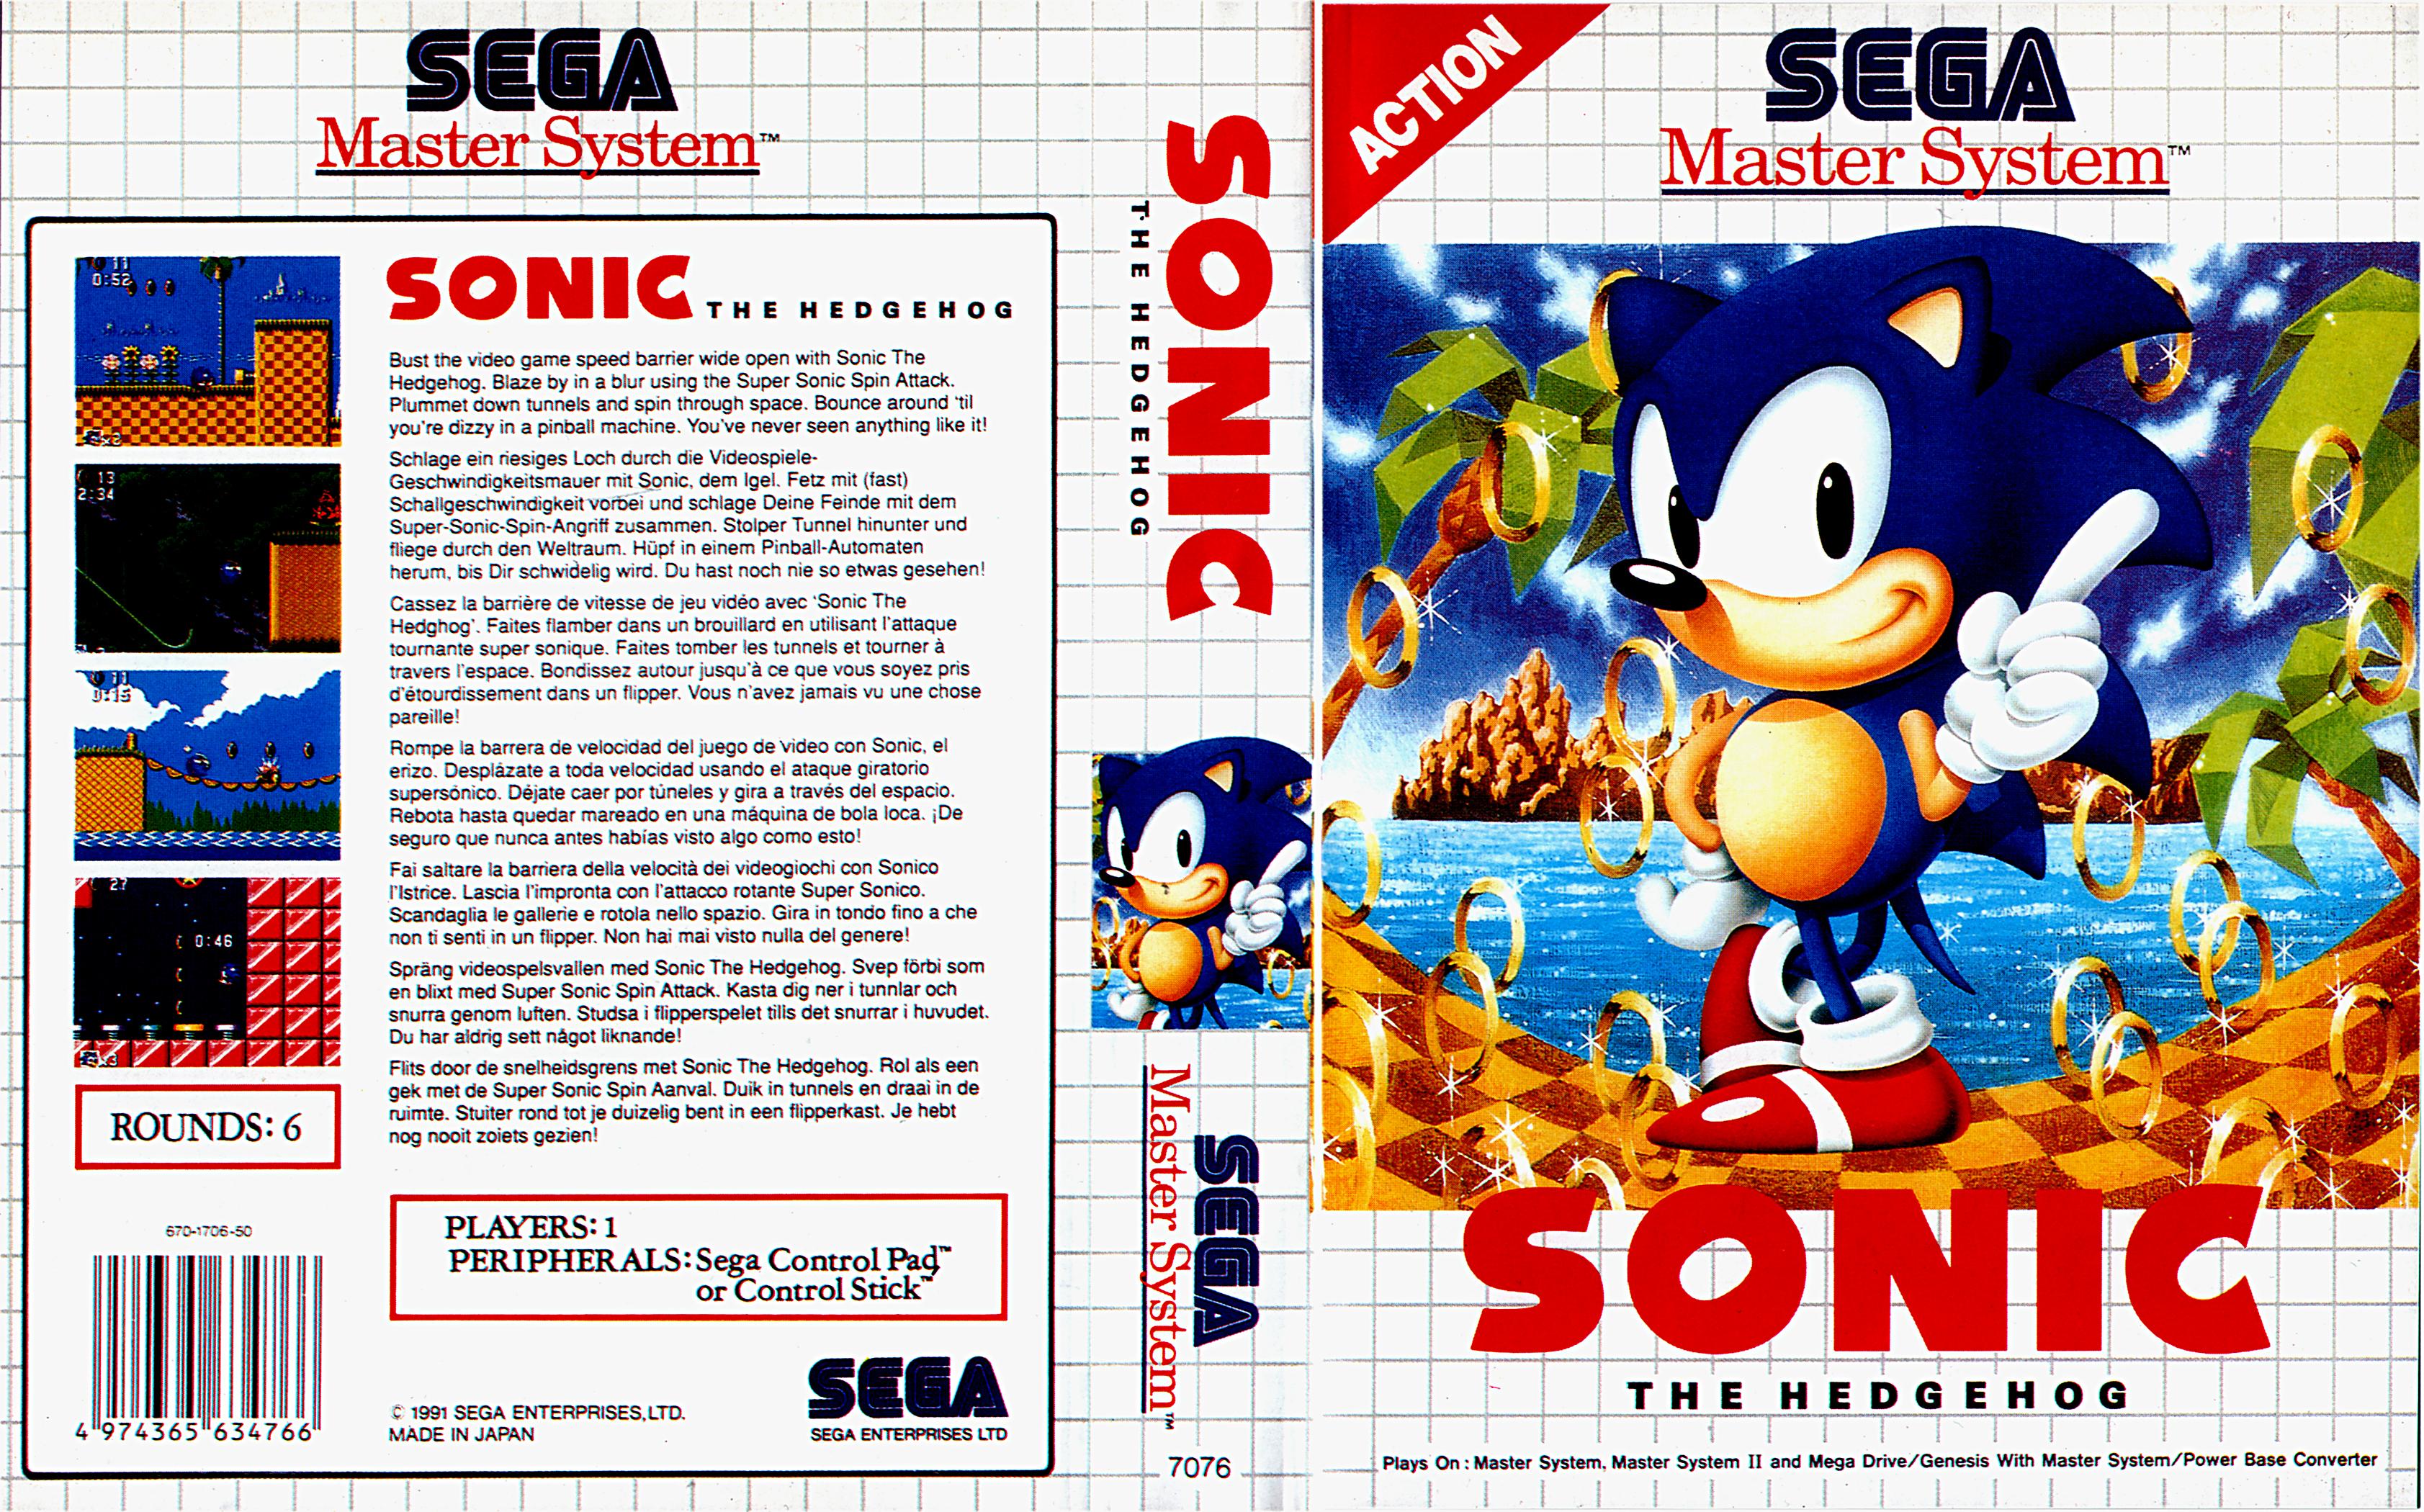 Sega Master System S Game Covers Box Scans Box Art CD ...